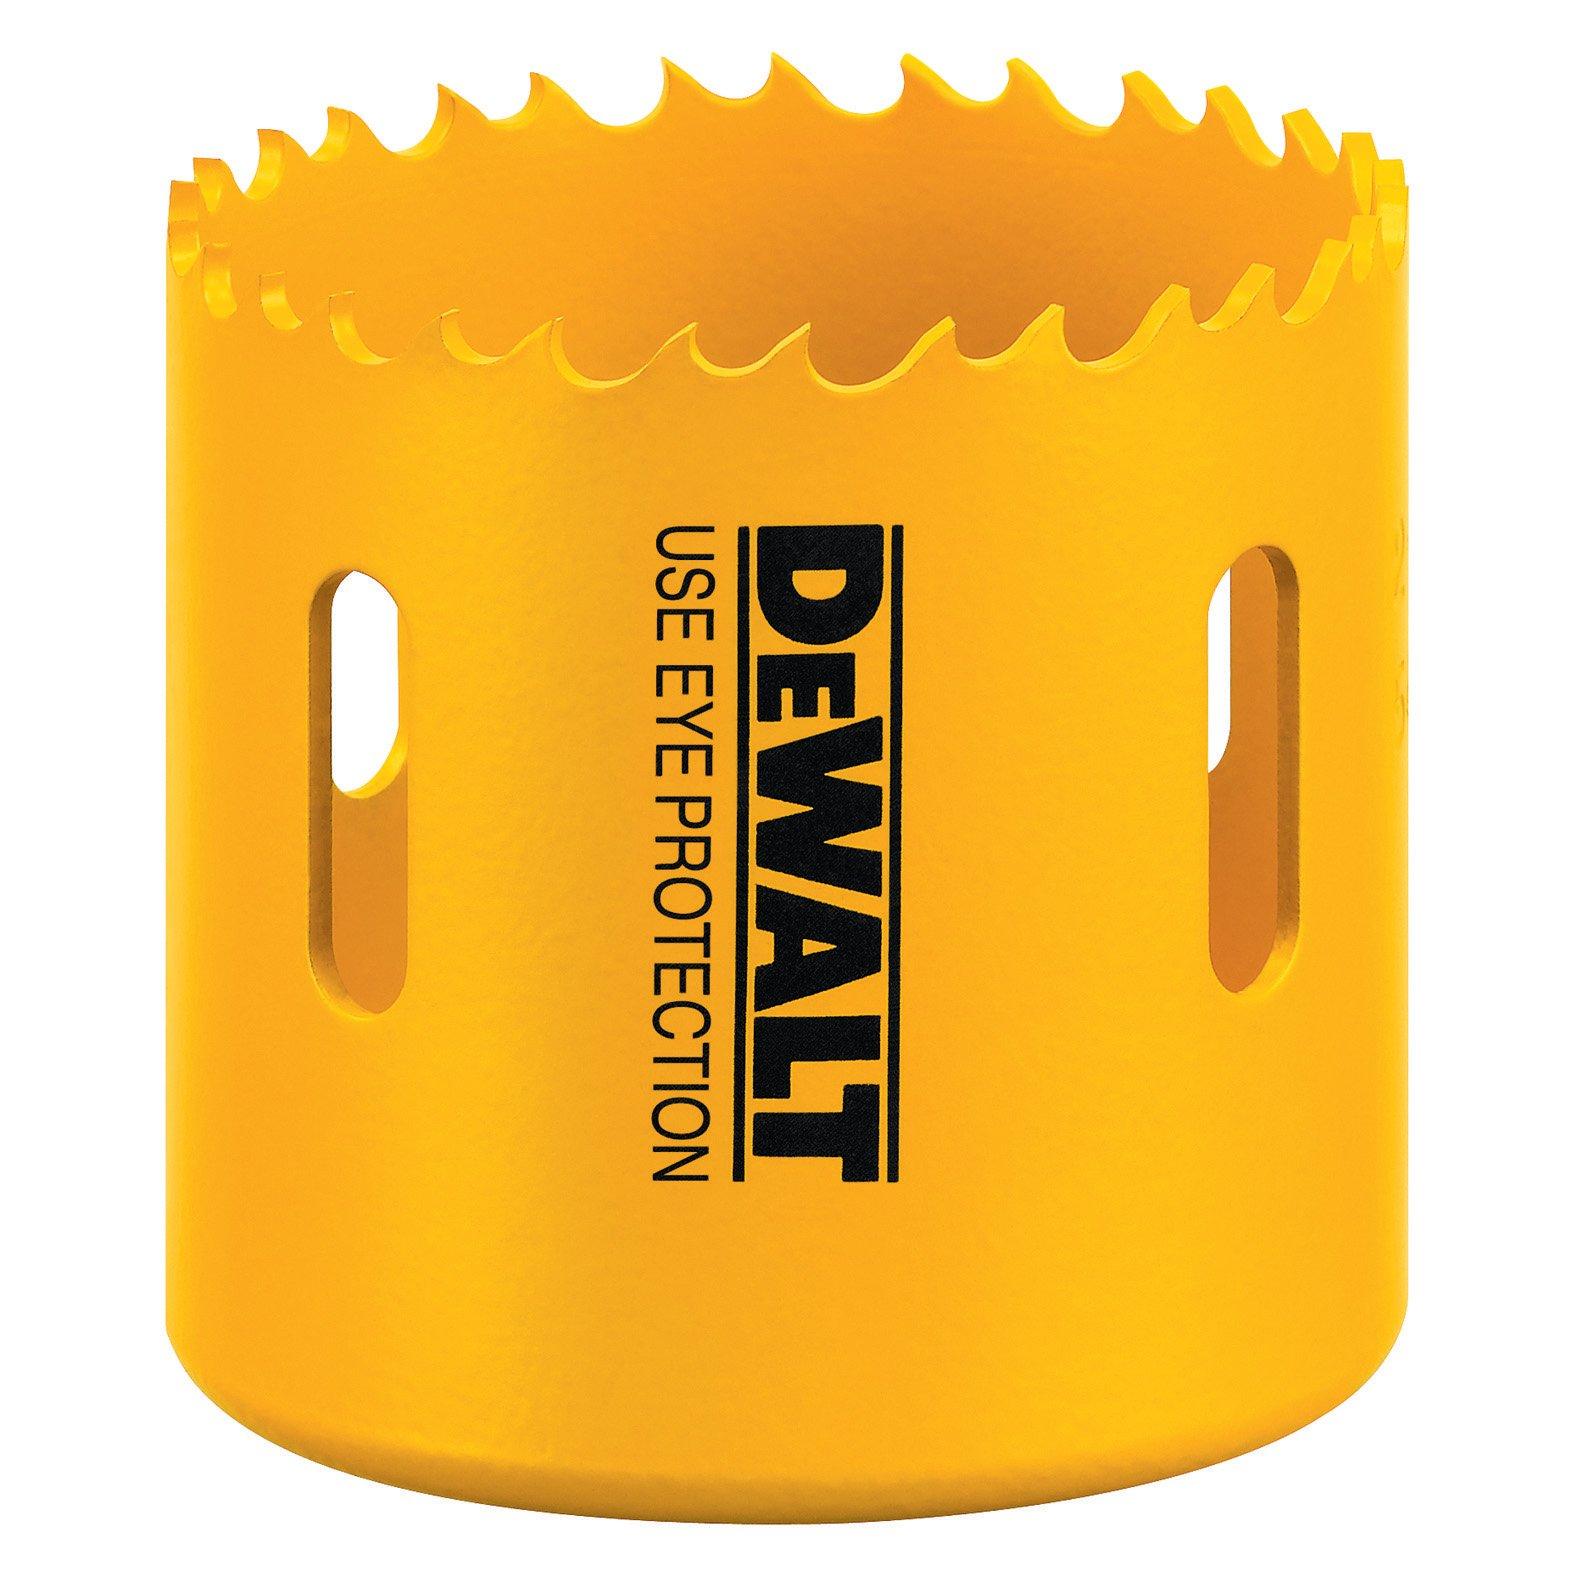 DEWALT D180052 3-1/4-Inch Standard Bi-Metal Hole Saw